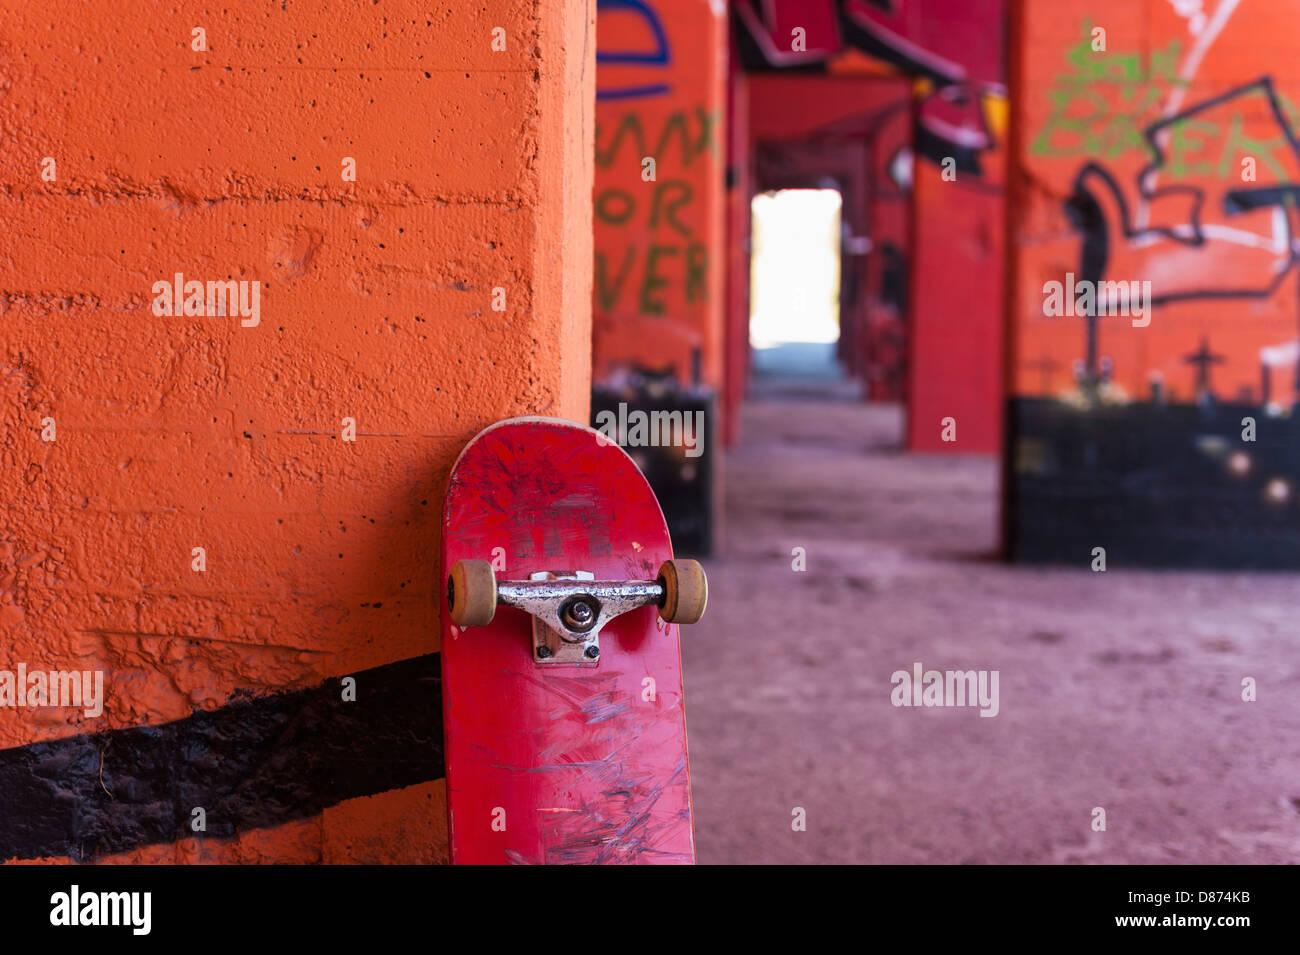 Graffiti Duisburg germany rhine westphalia duisburg skateboard against stock